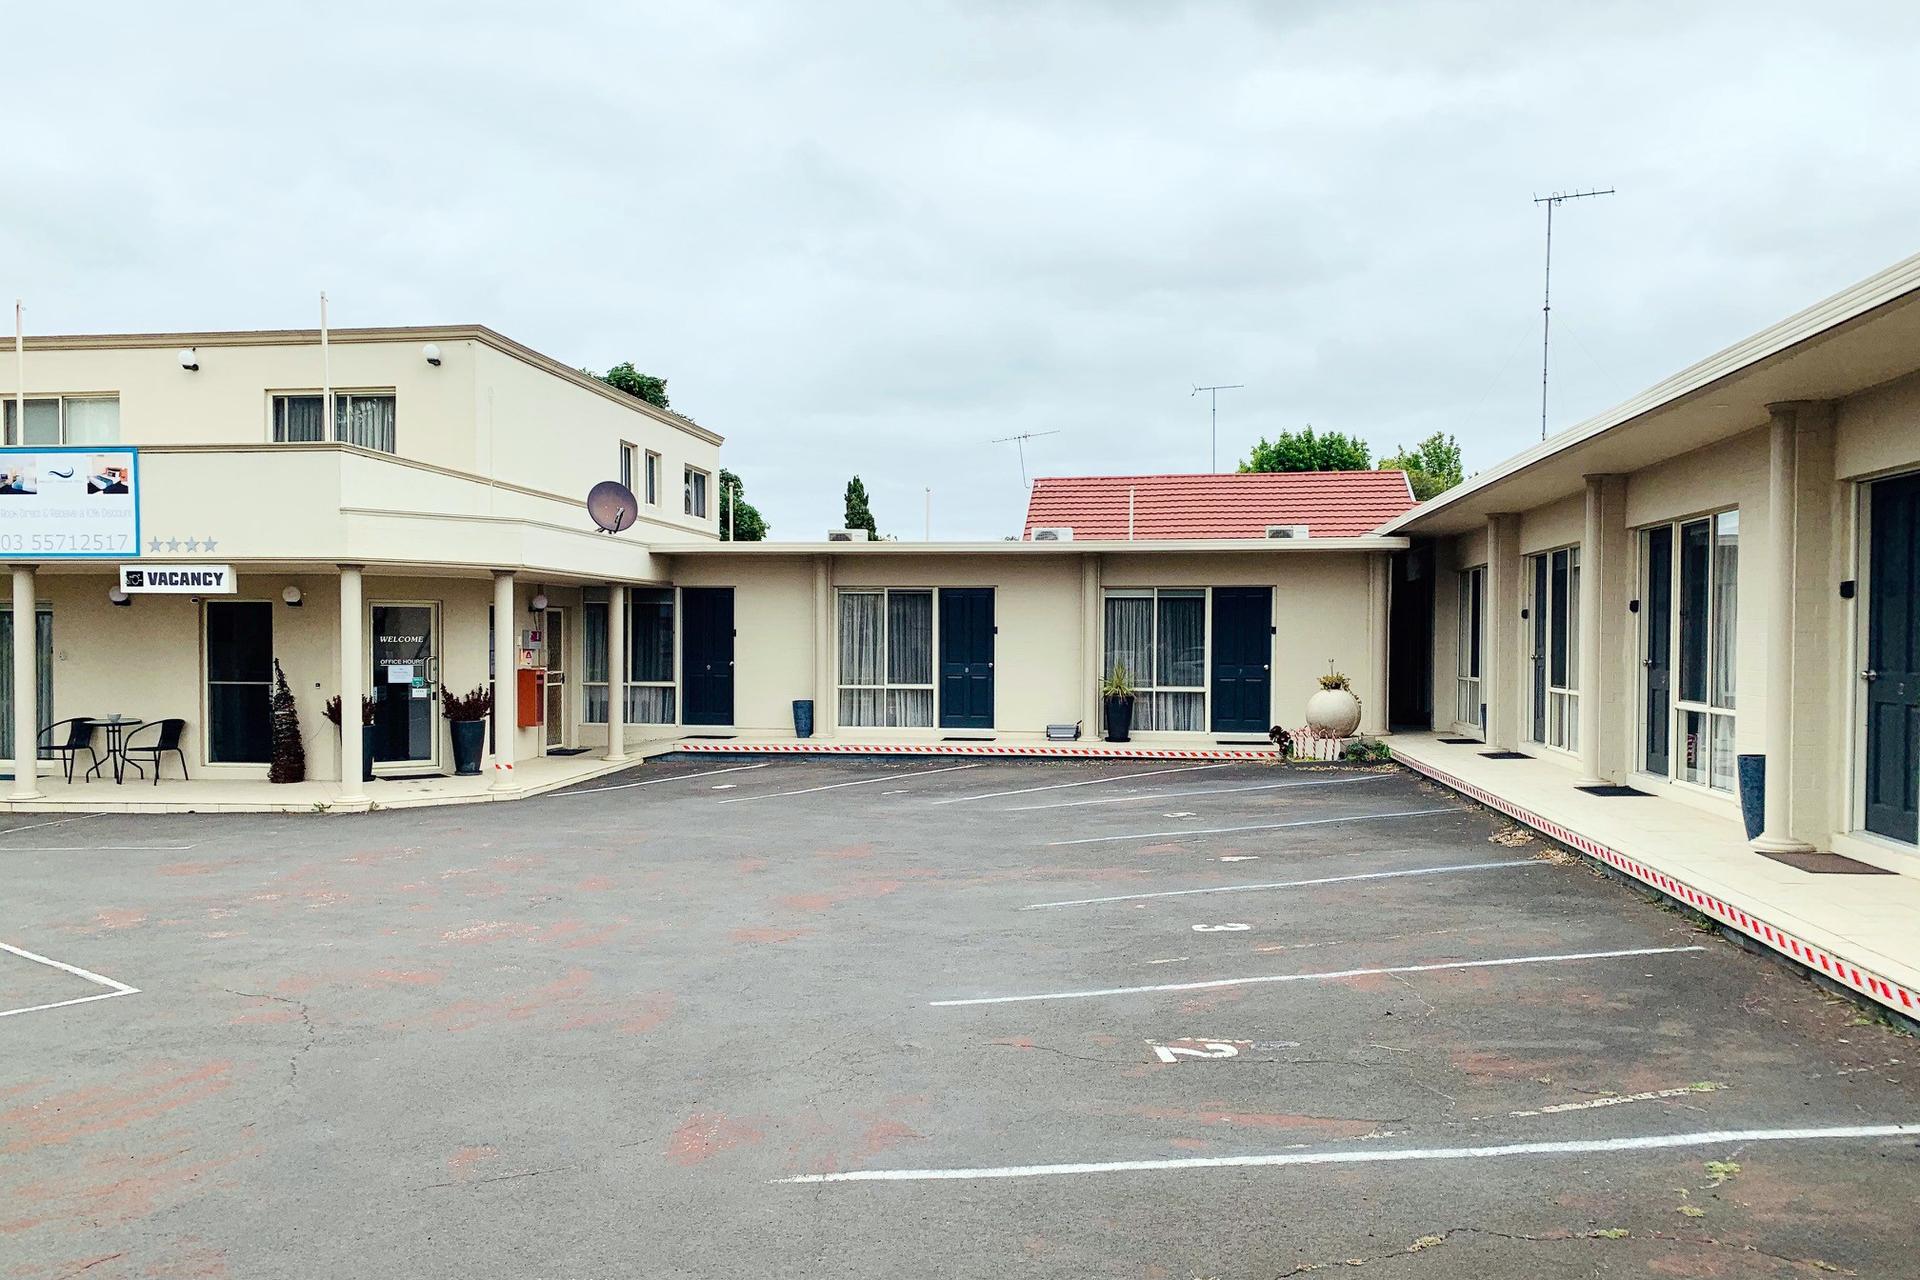 d - Hamilton Townhouse Motel